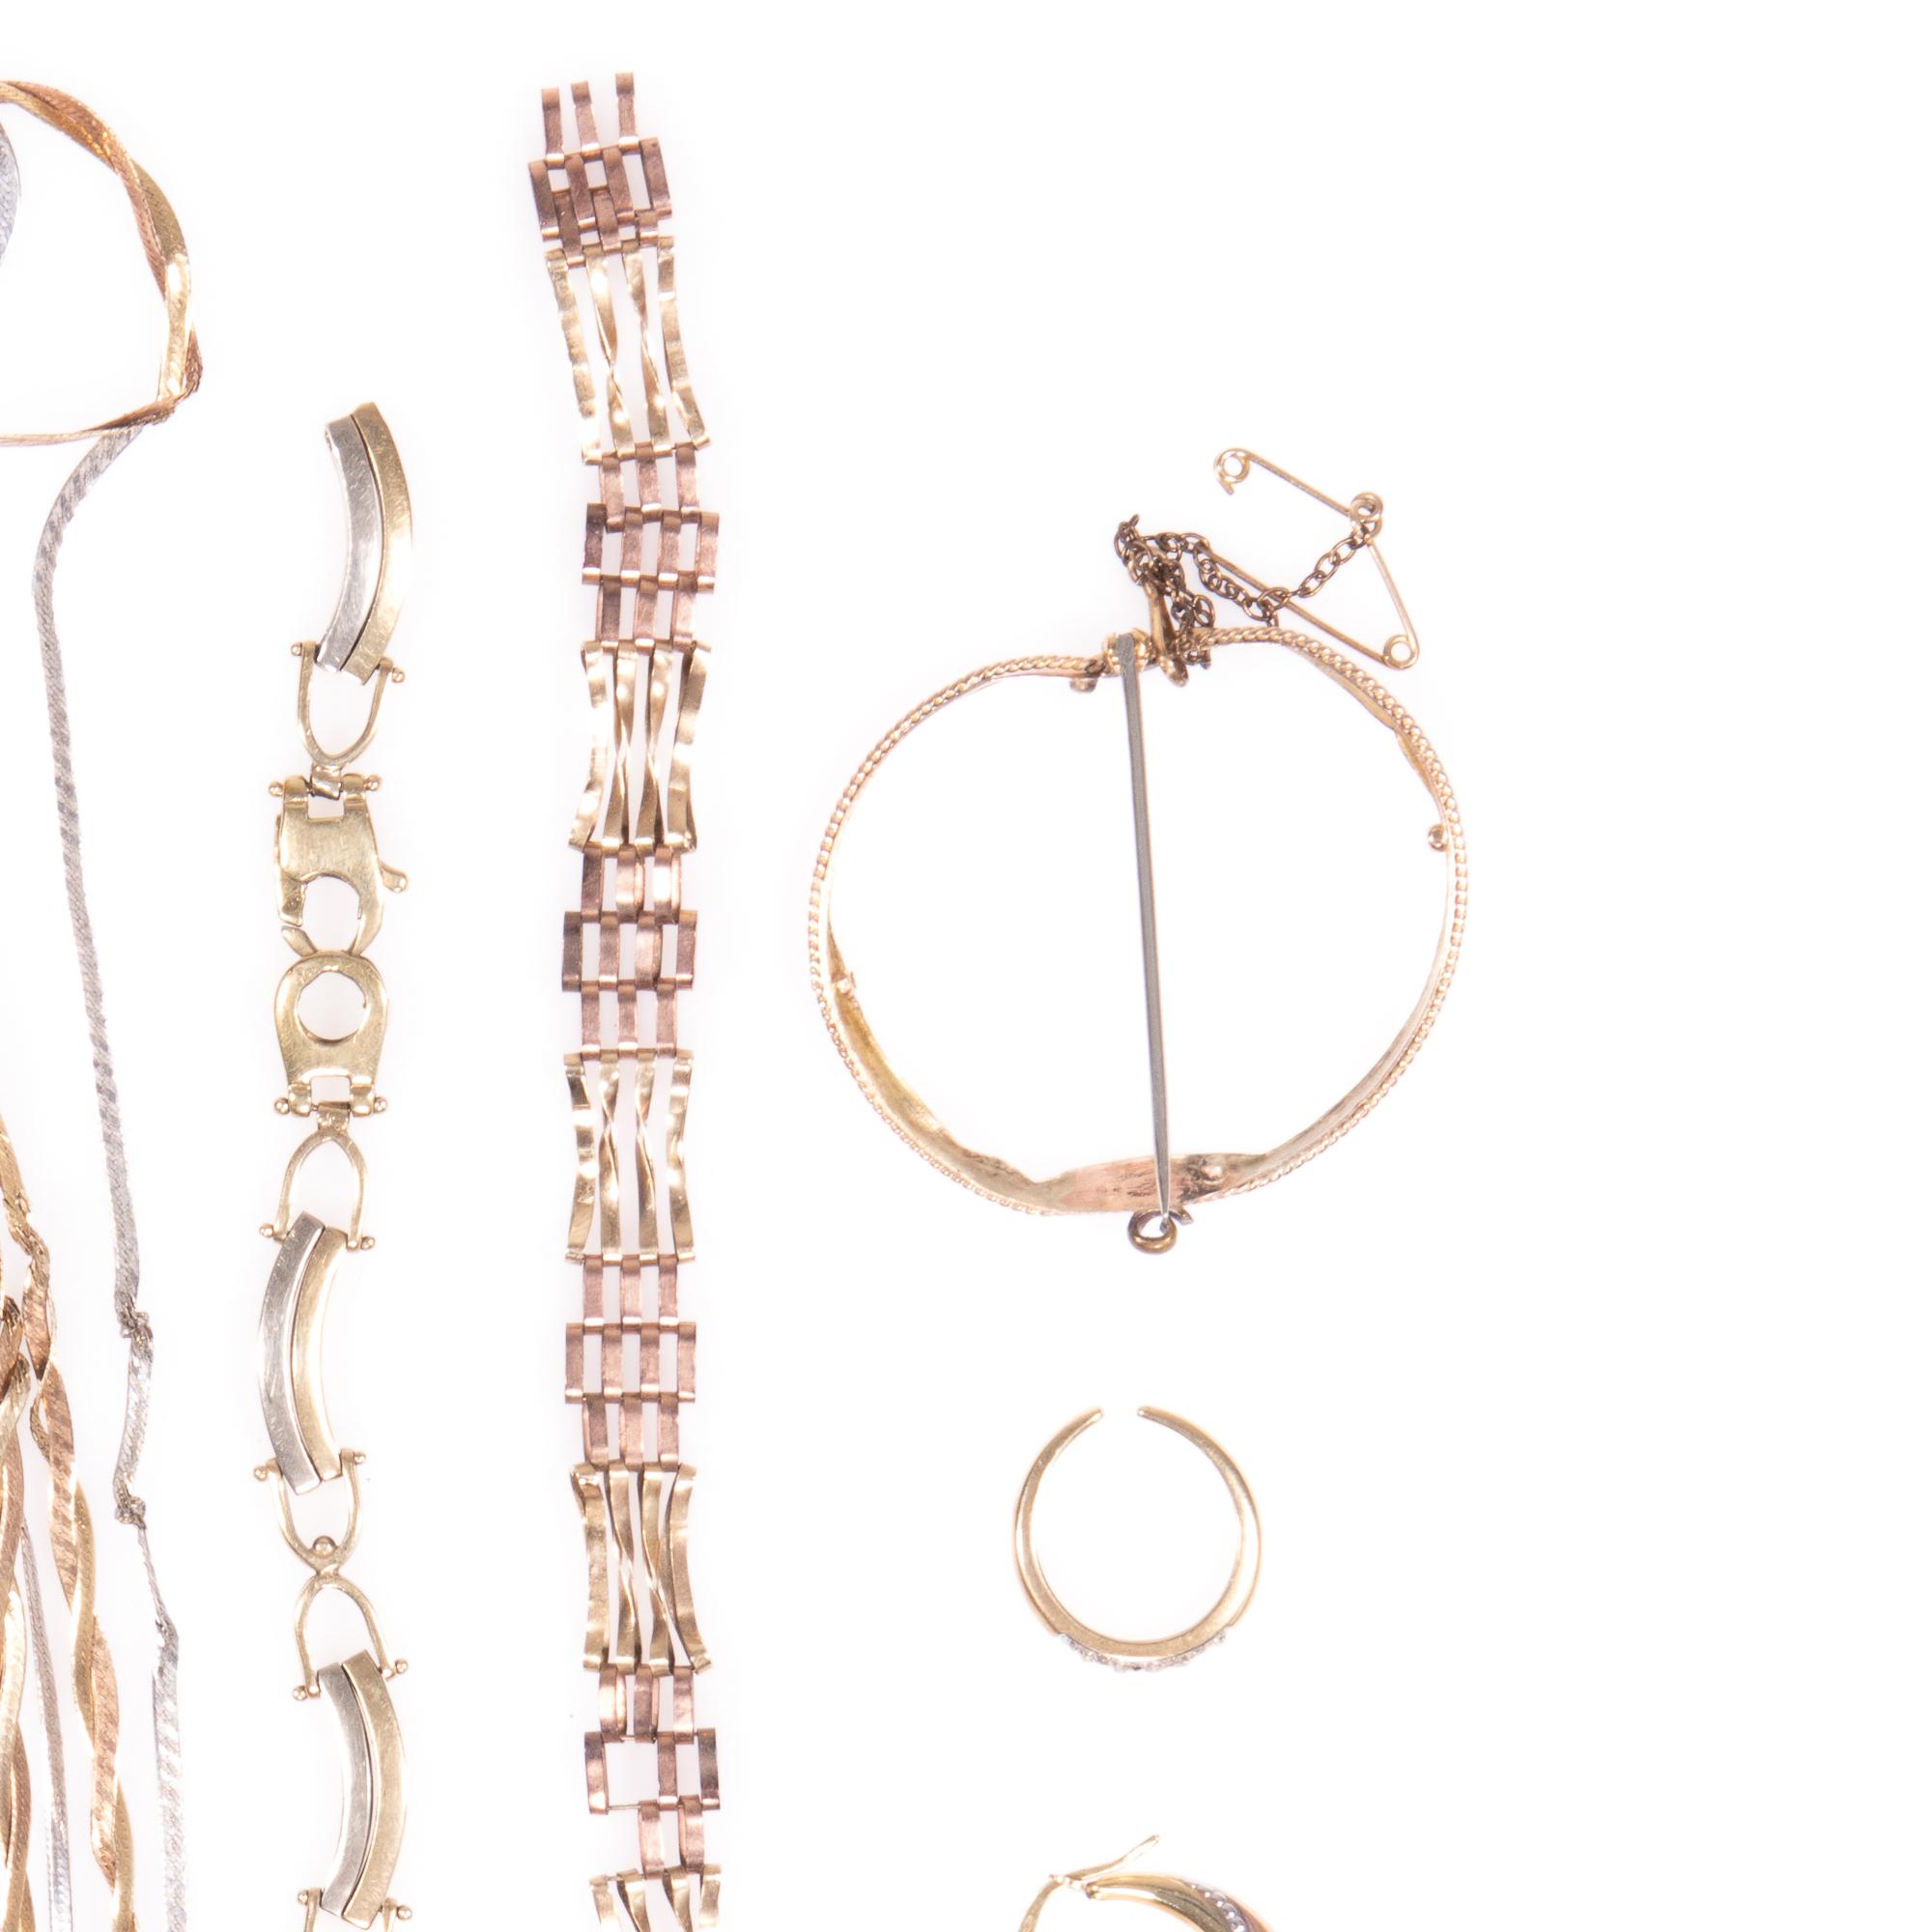 26 grams Scrap Gold Jewellery - Image 6 of 6